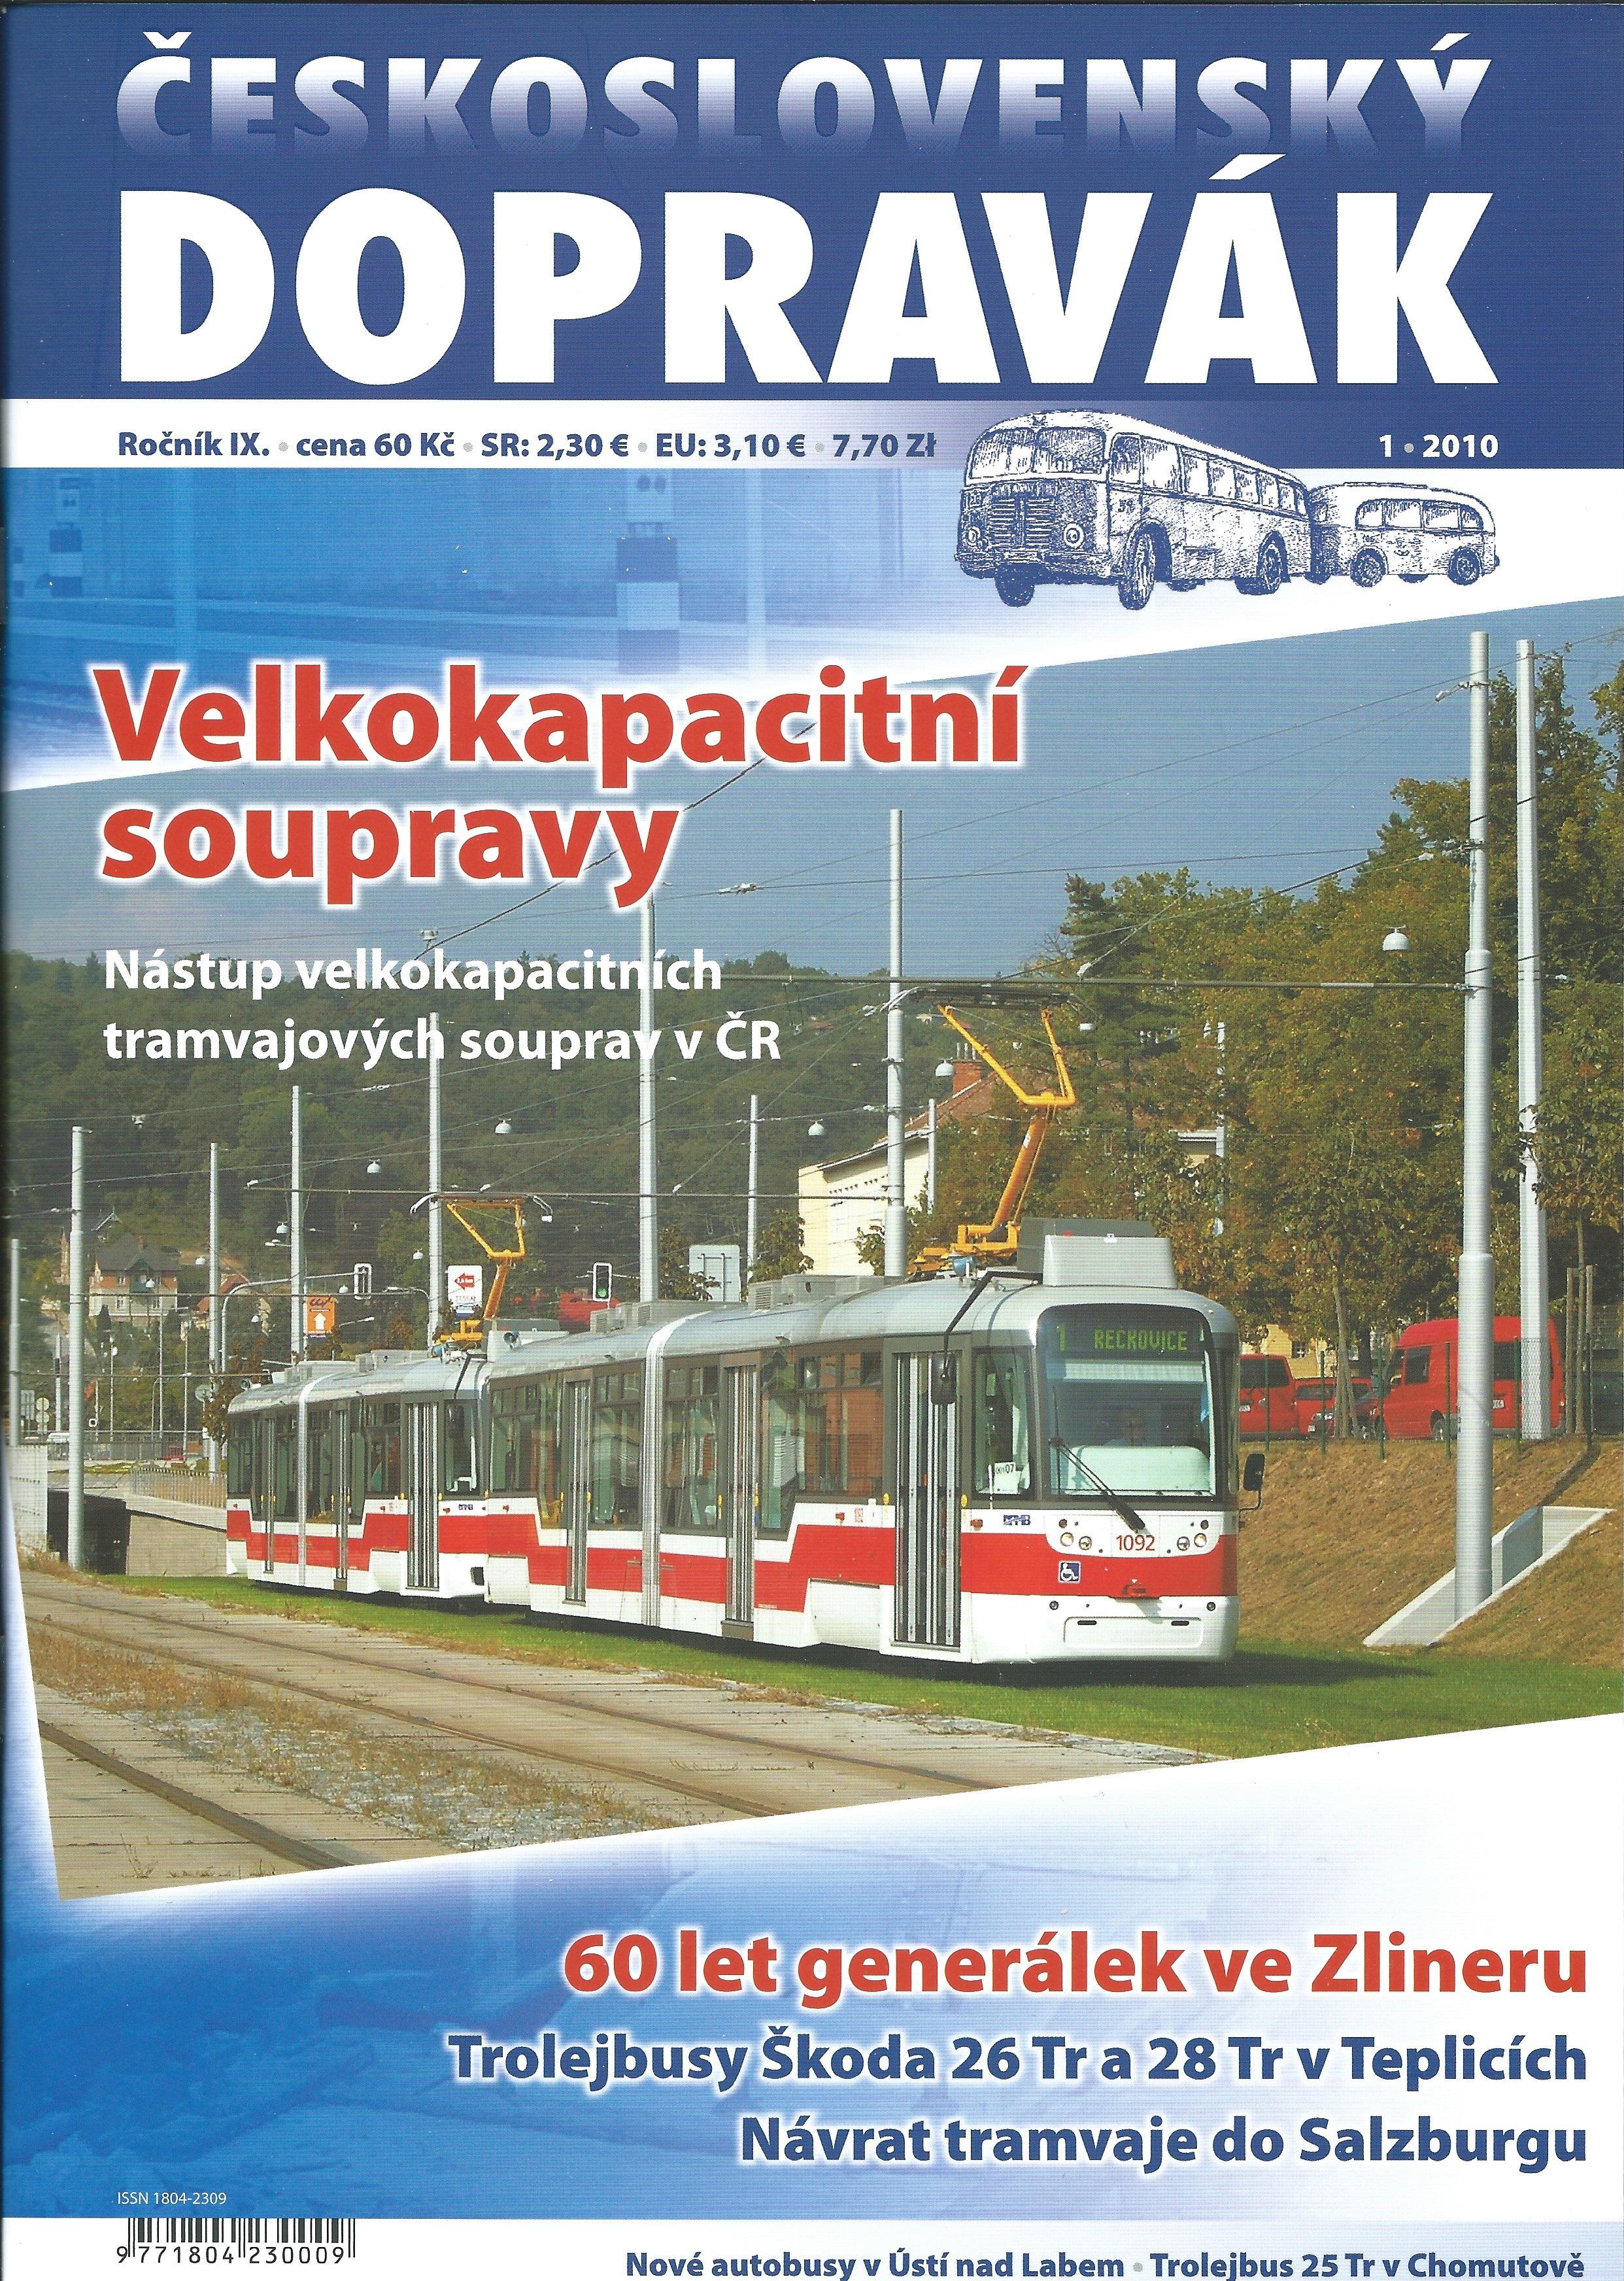 Grafická podoba časopisu z let 2010-2013. (sbírka: Libor Hinčica)